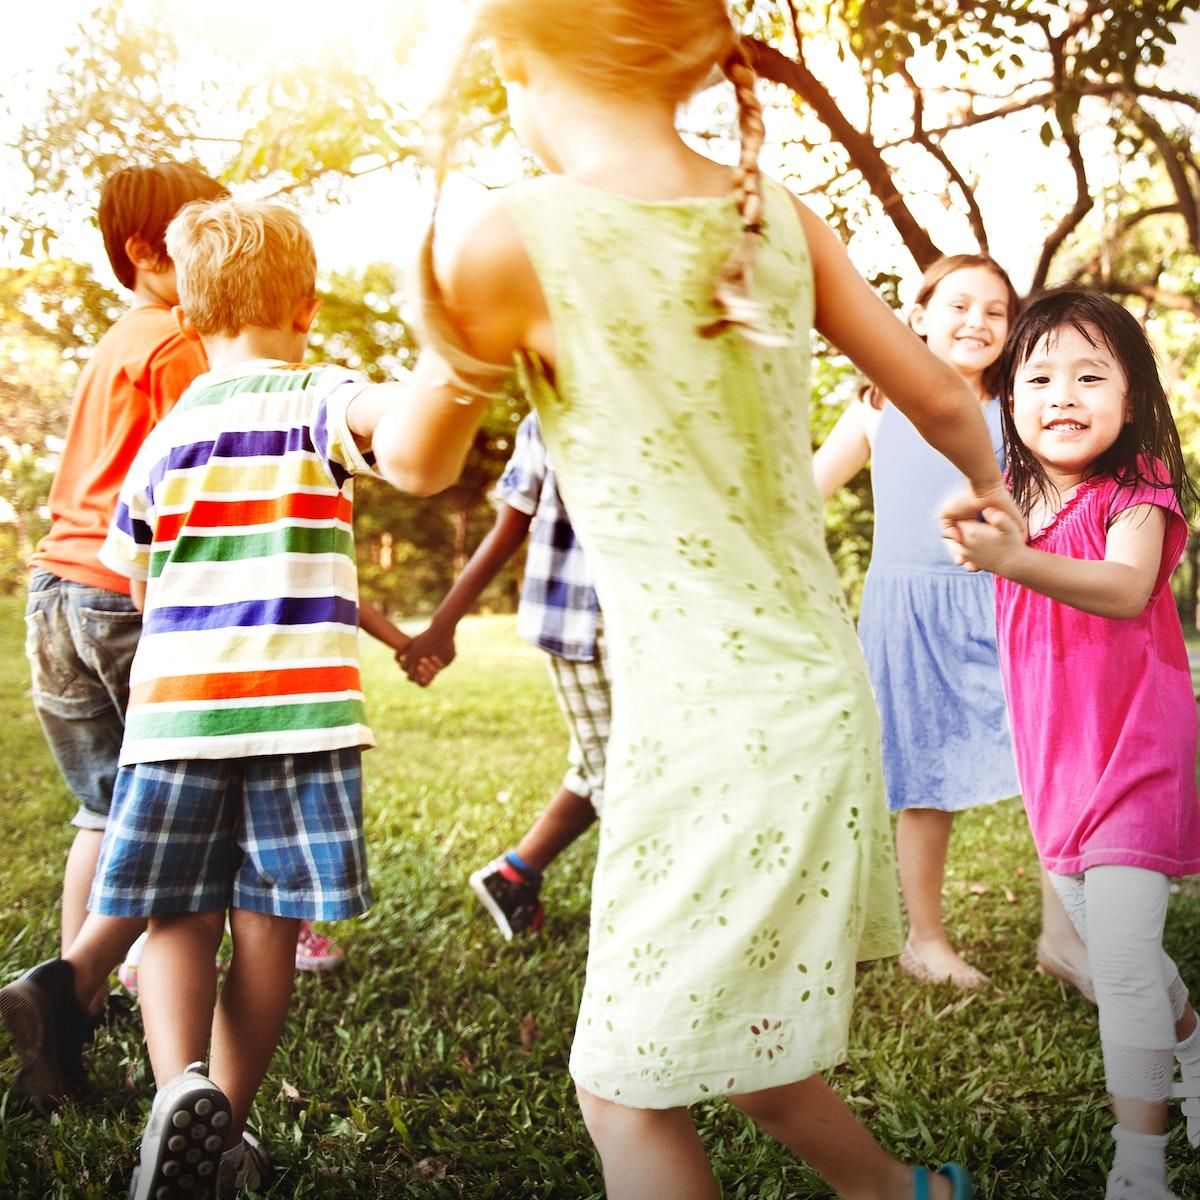 Cute diverse kids dancing in the park